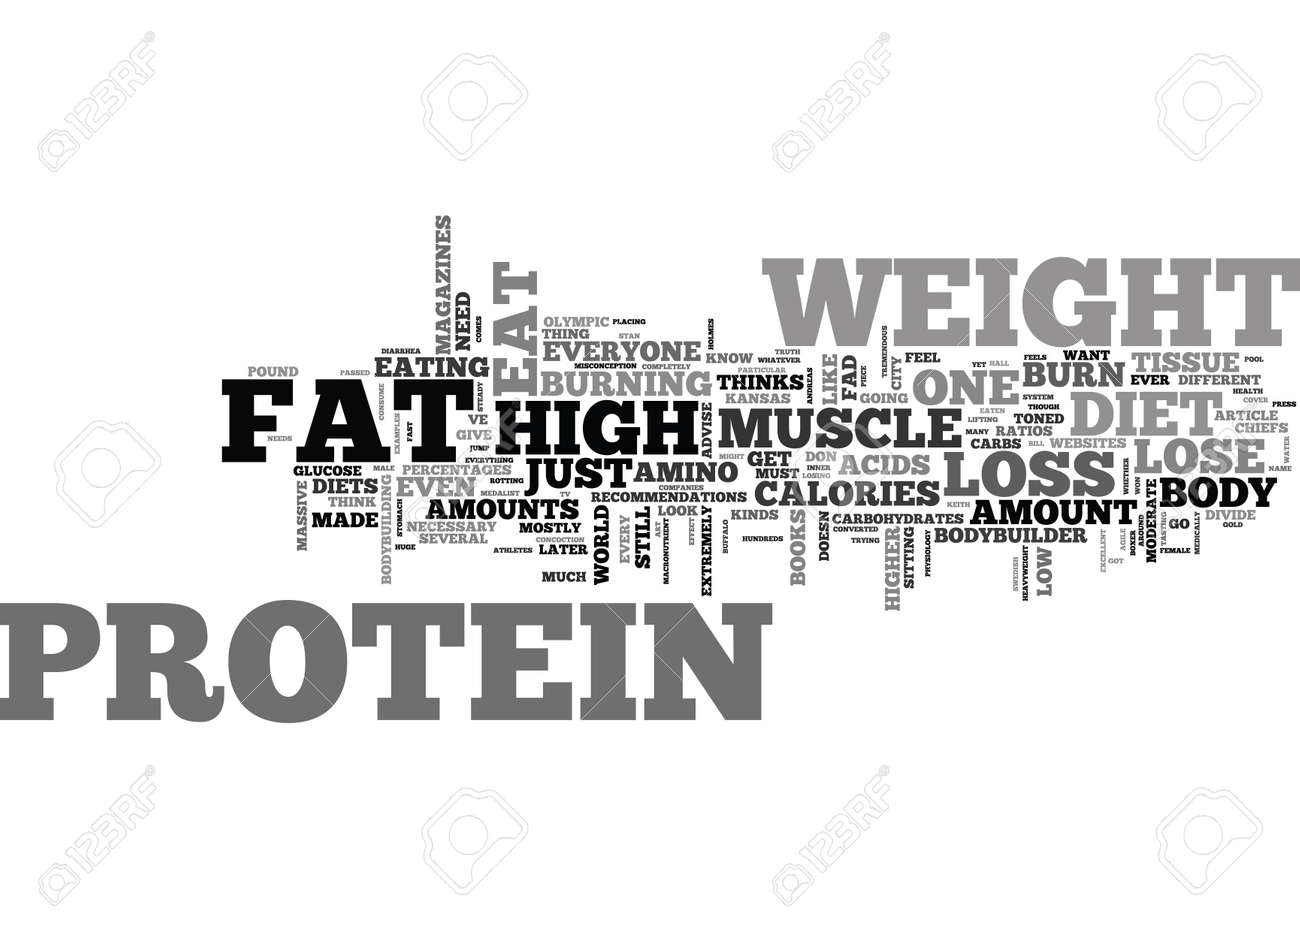 6 week diet plan for fat loss